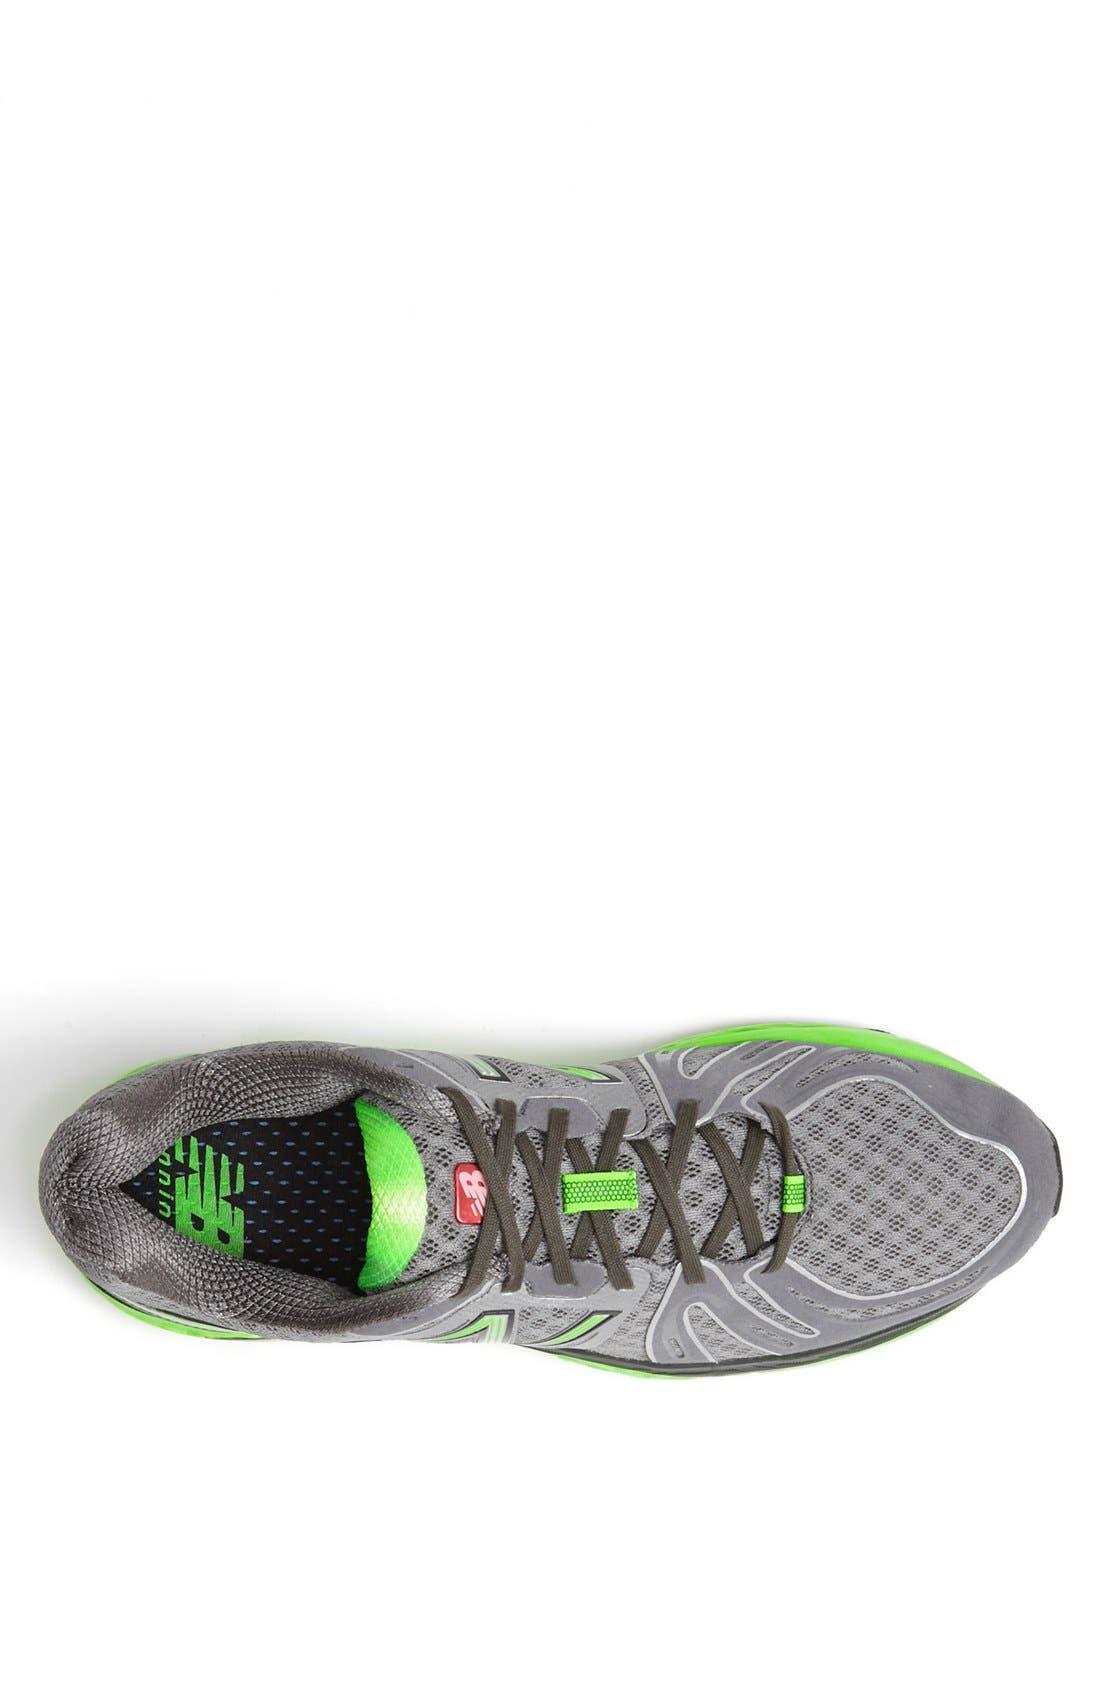 Alternate Image 3  - New Balance '790' Running Shoe (Men) (Online Only Color)